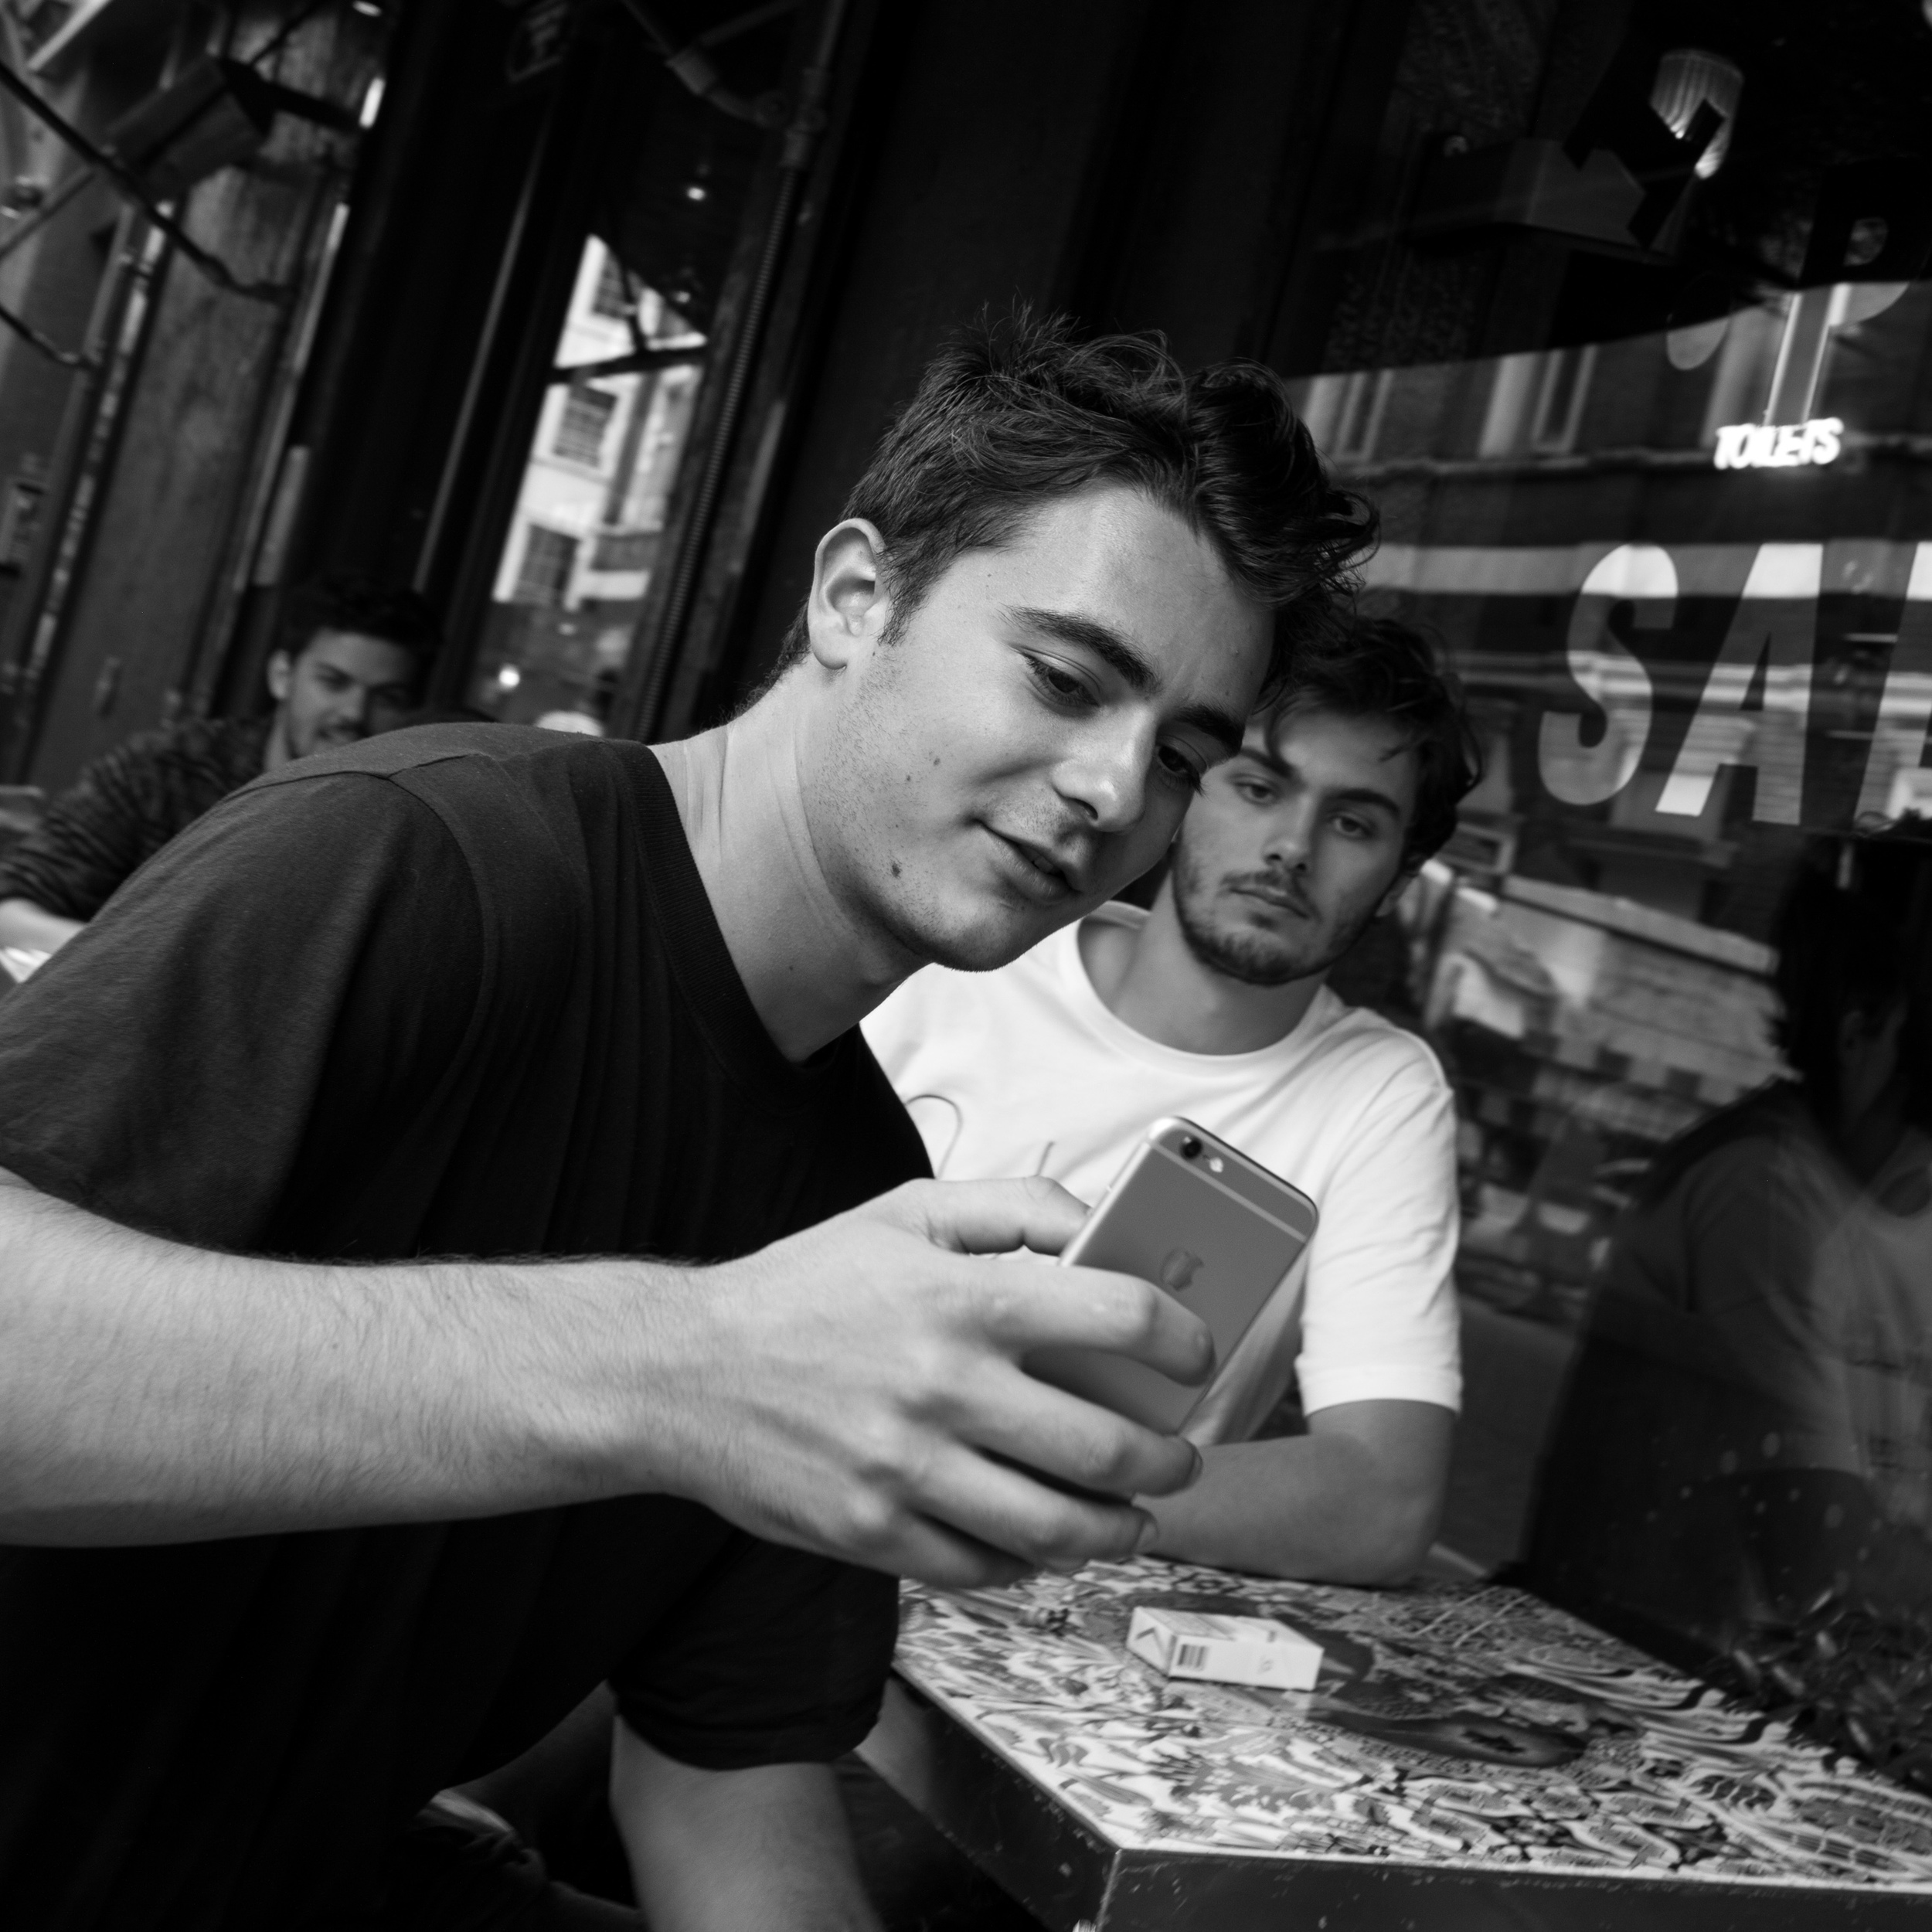 Selfie -Leica MM with Leica 35mm Summarit ASPH